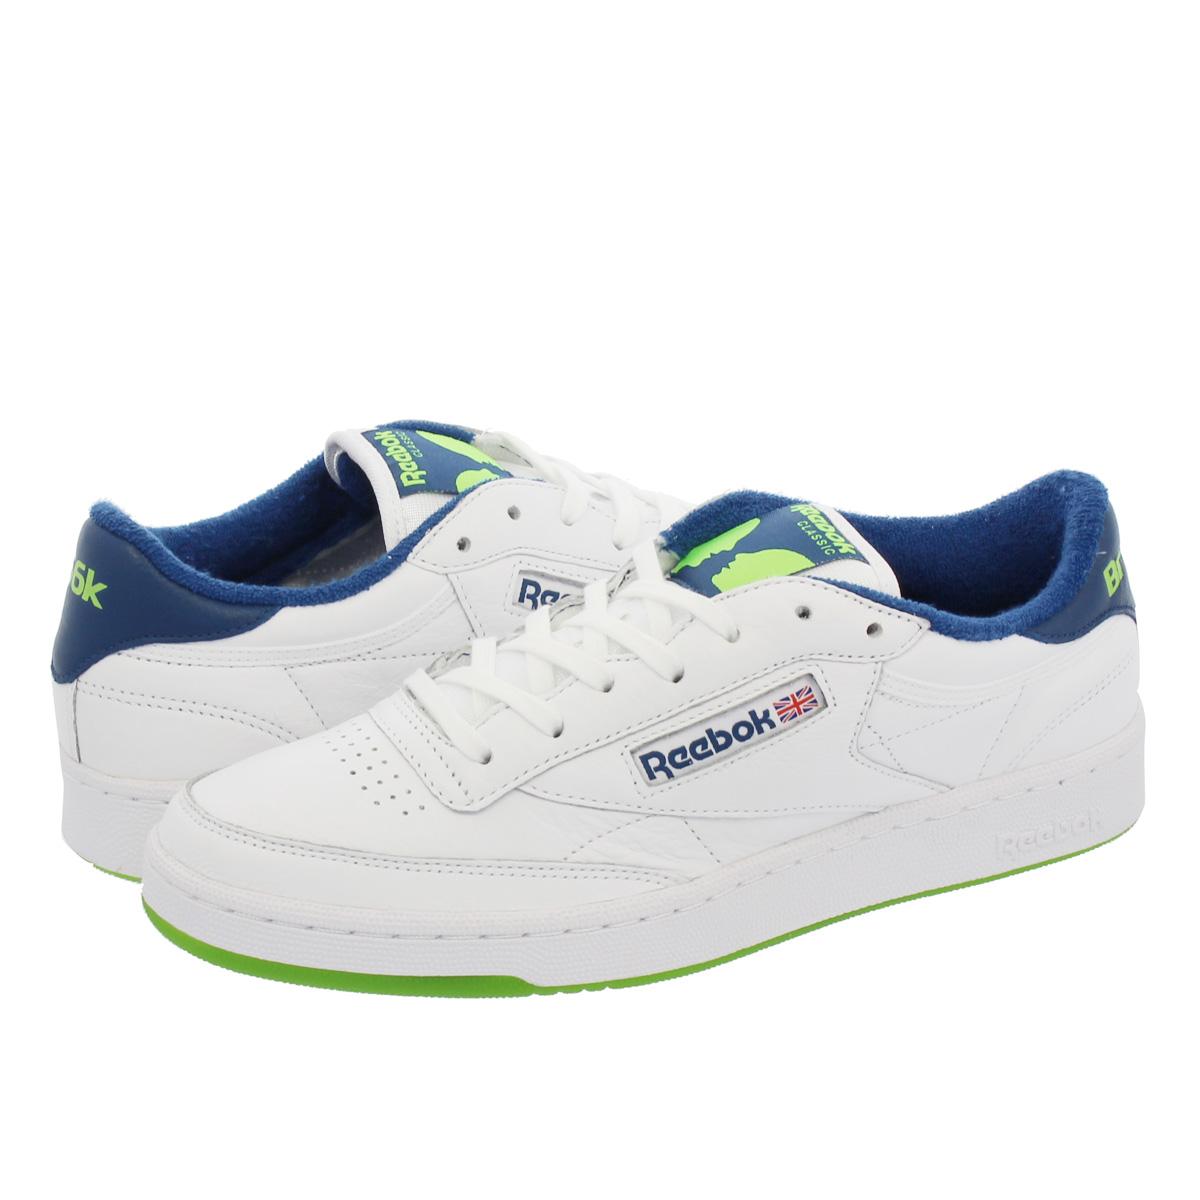 Reebok CLUB C 85 BRONZE リーボック クラブ C 85 ブロンズ NOBLE BLUE/GREEN/WHITE dv4822